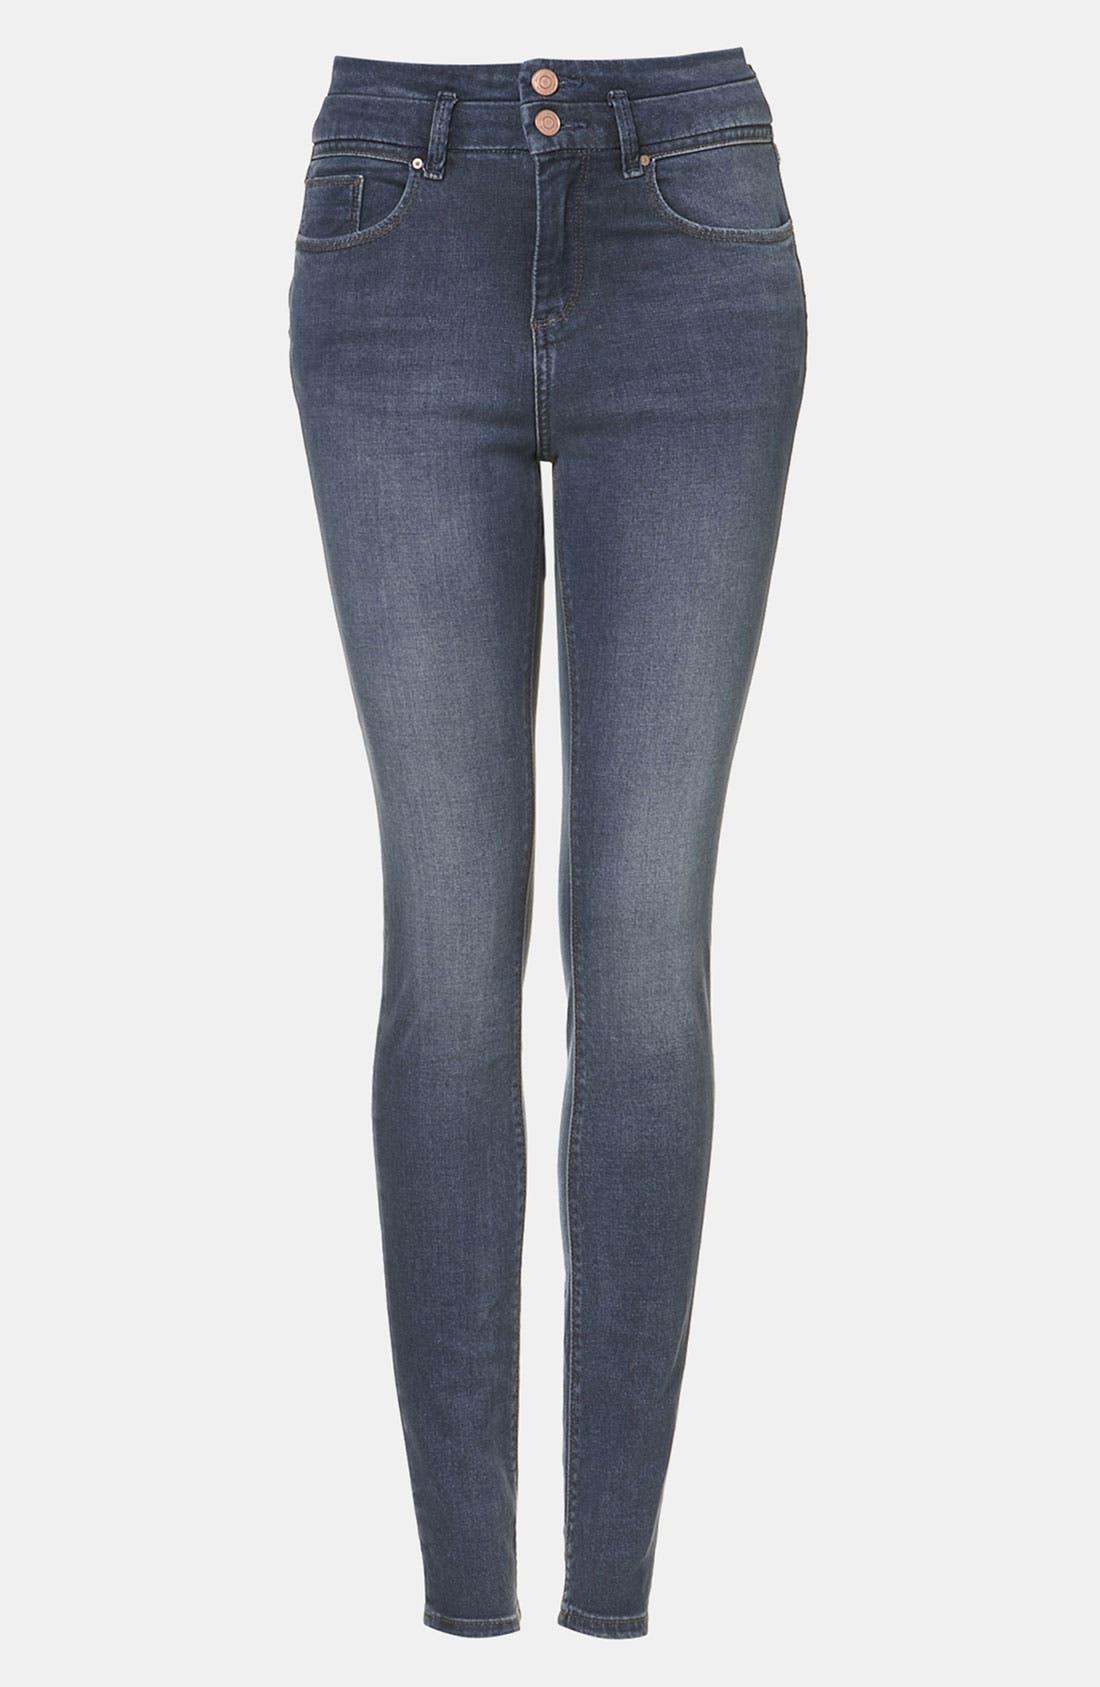 Alternate Image 1 Selected - Topshop Moto 'Kristen' High Waist Skinny Jeans (Midstone)